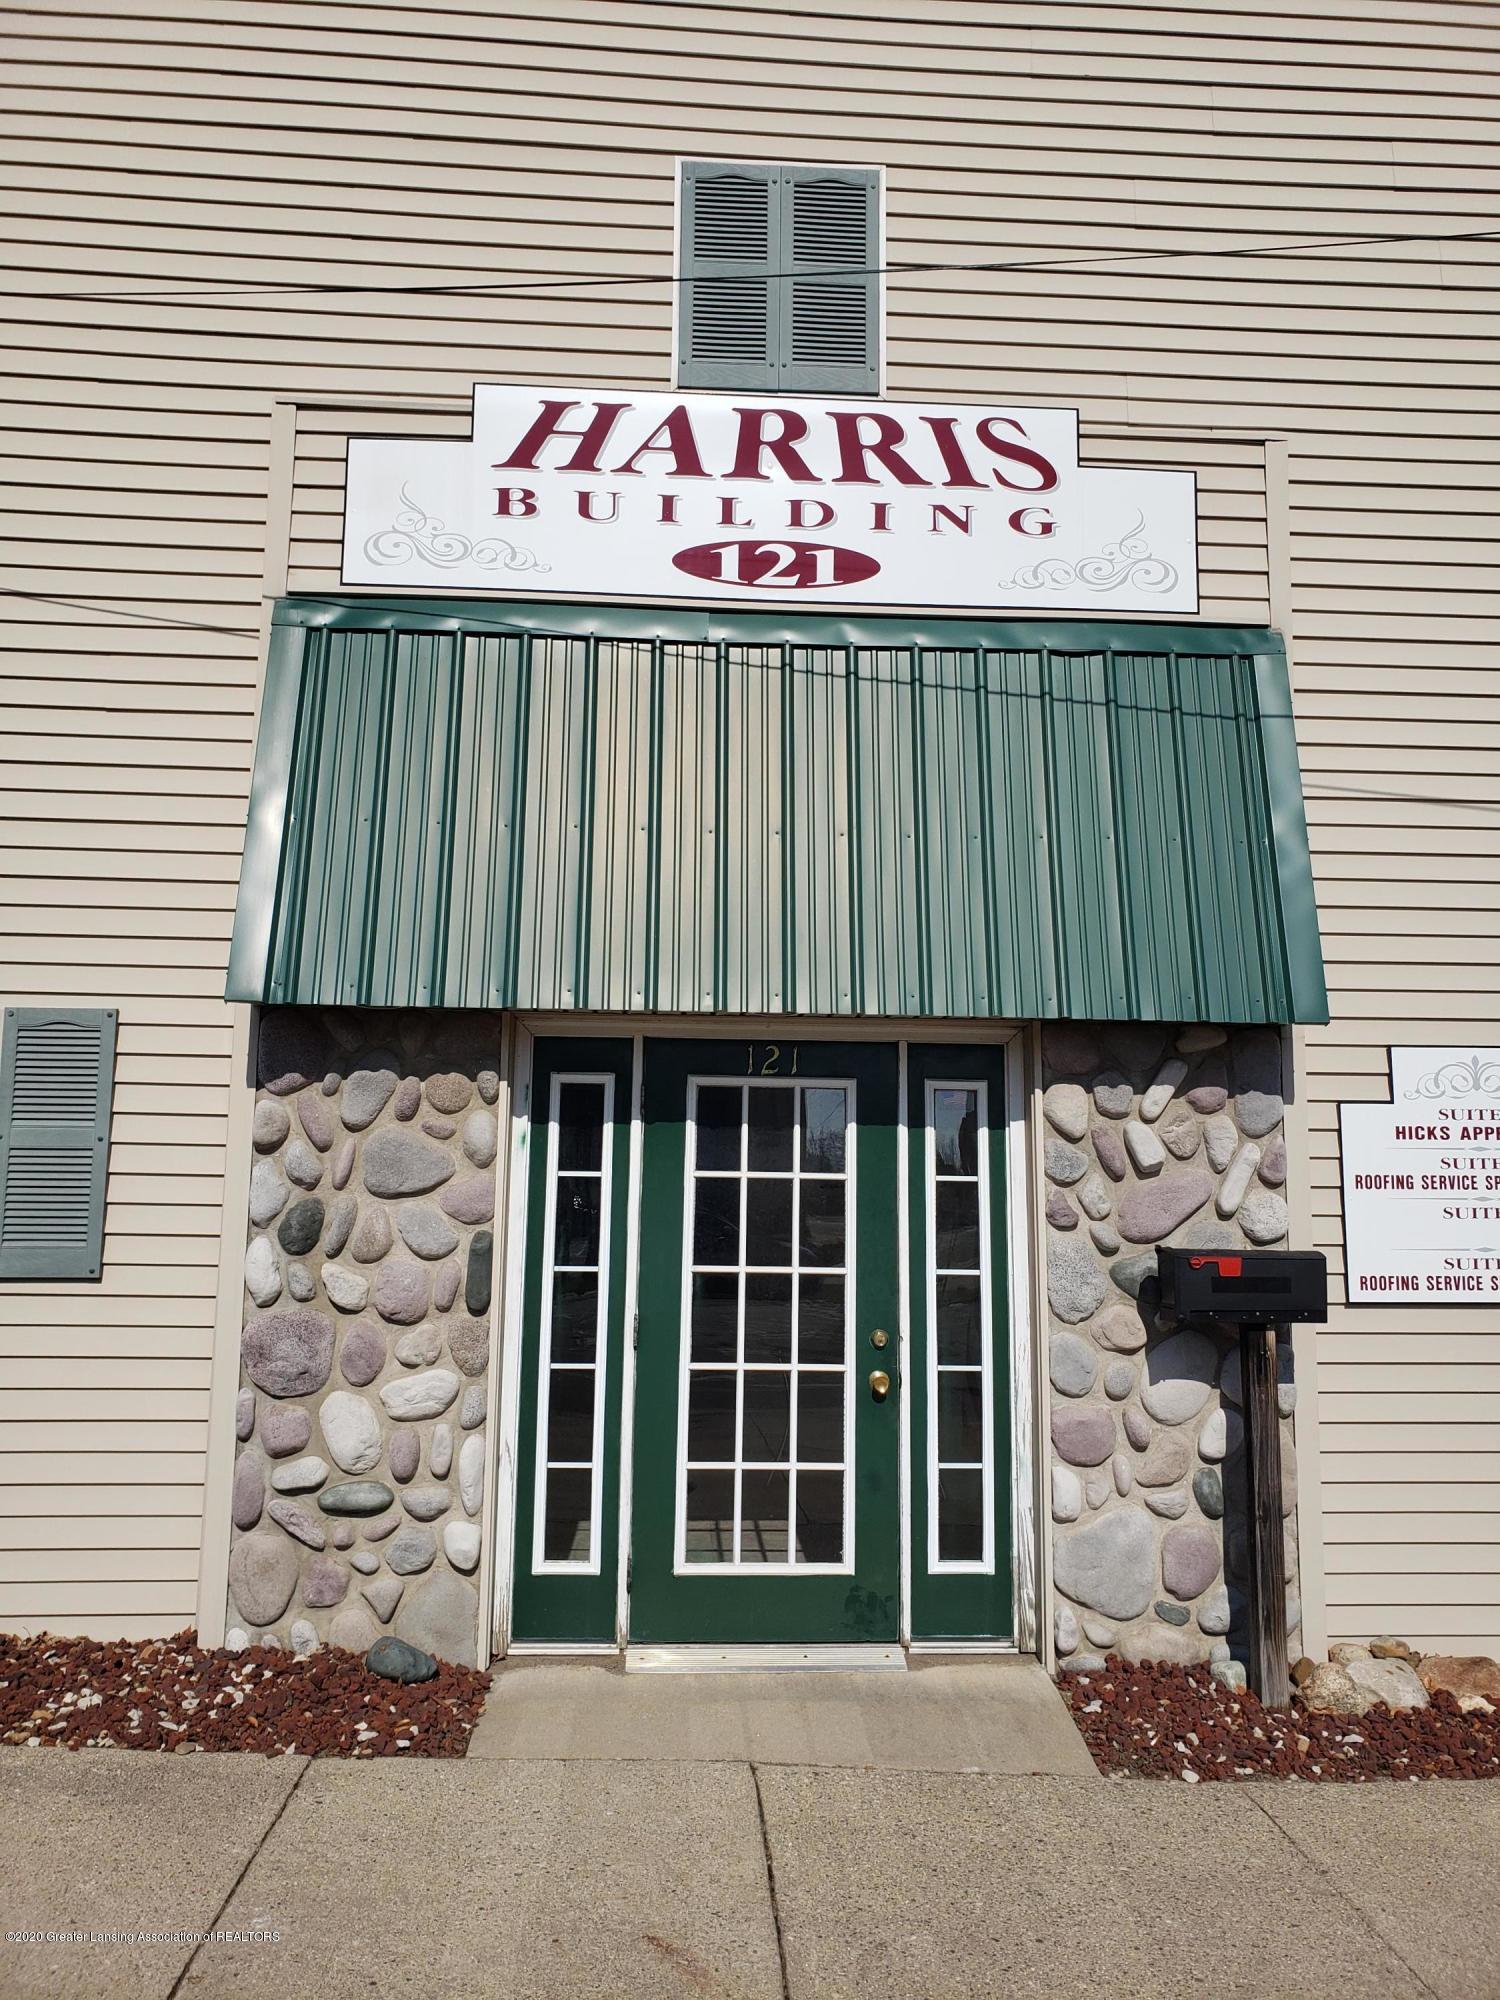 121 E Harris St - 20200223_124933 - 2